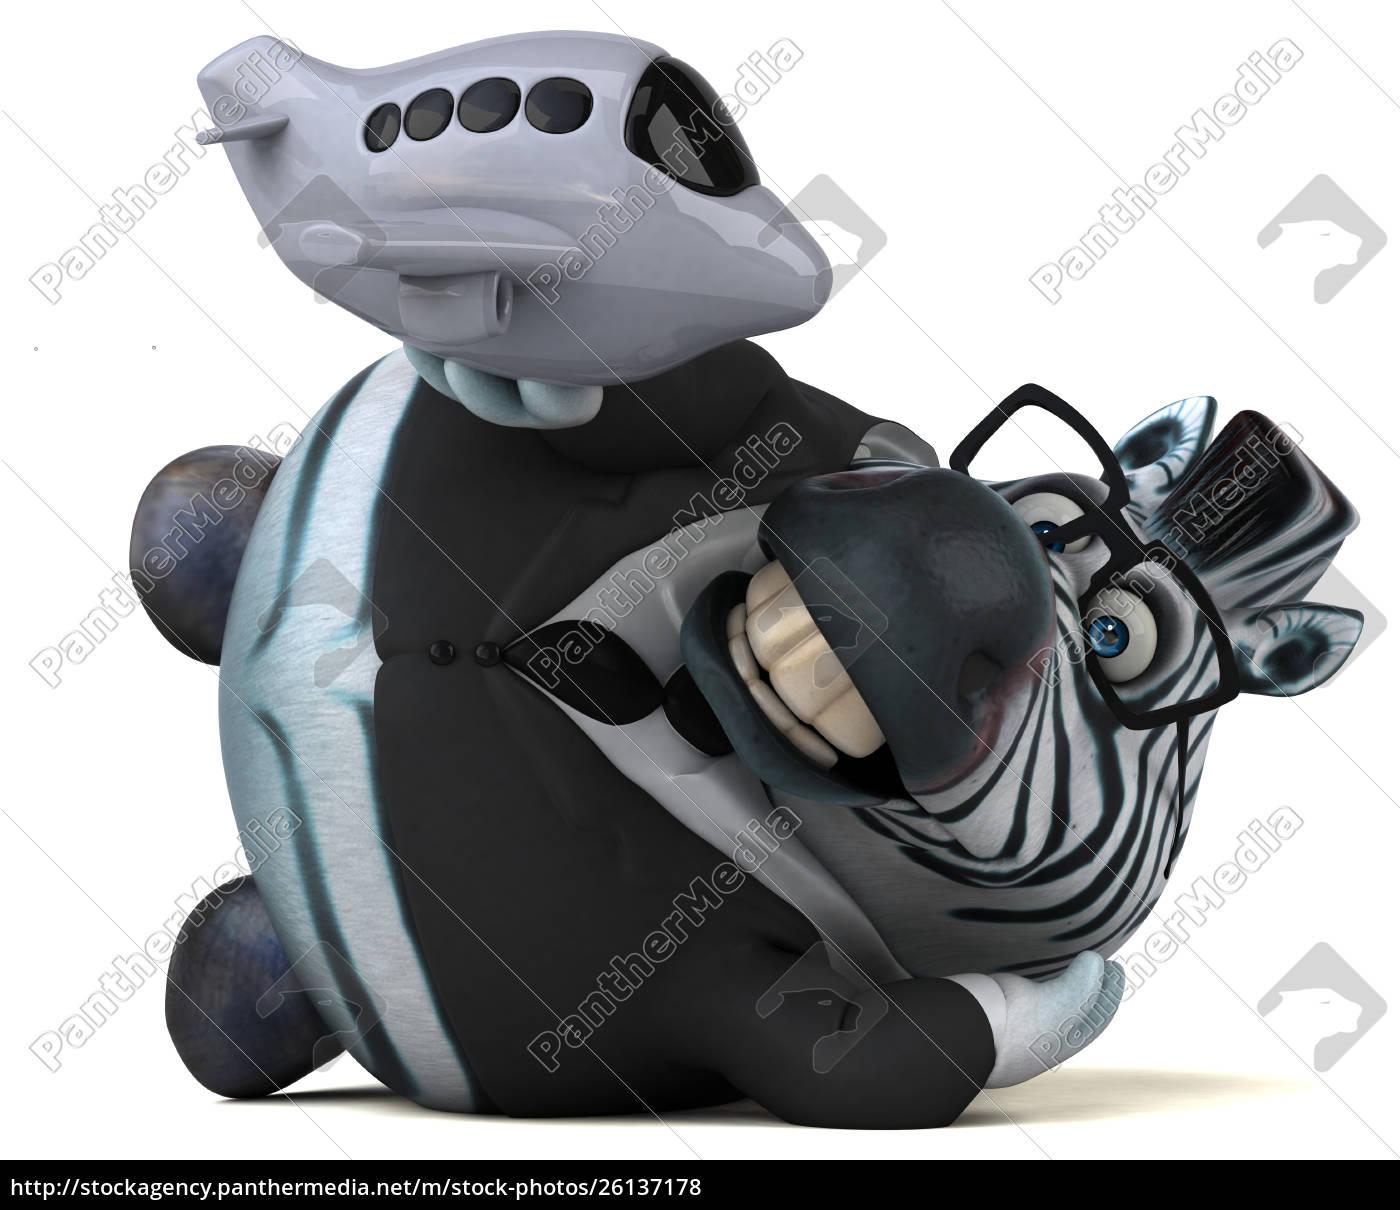 robot, -, 3d, illustration - 26137178